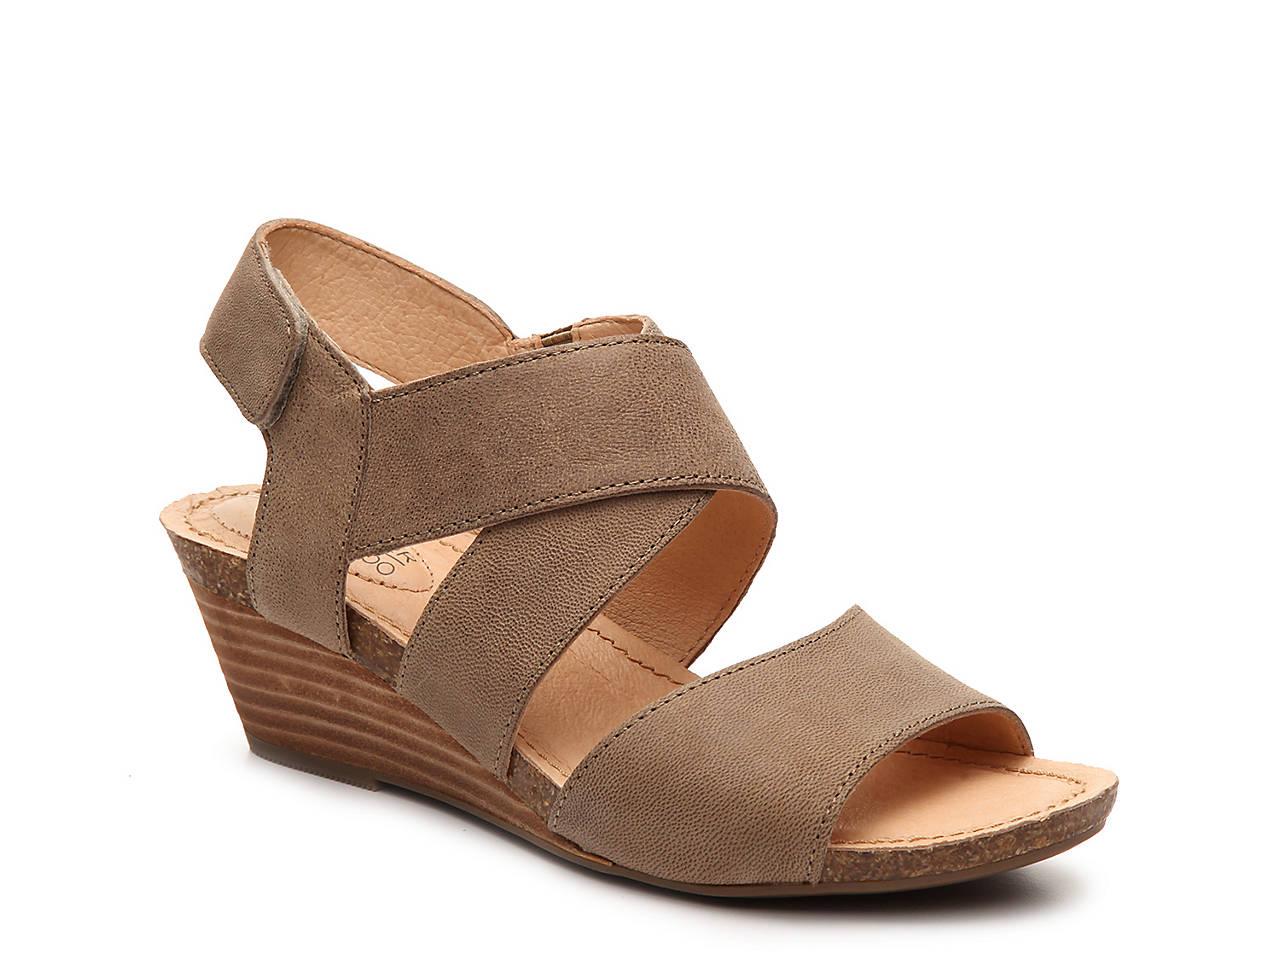 0cb1f73aa0 Adam Tucker by Me Too Toree Wedge Sandal Women s Shoes